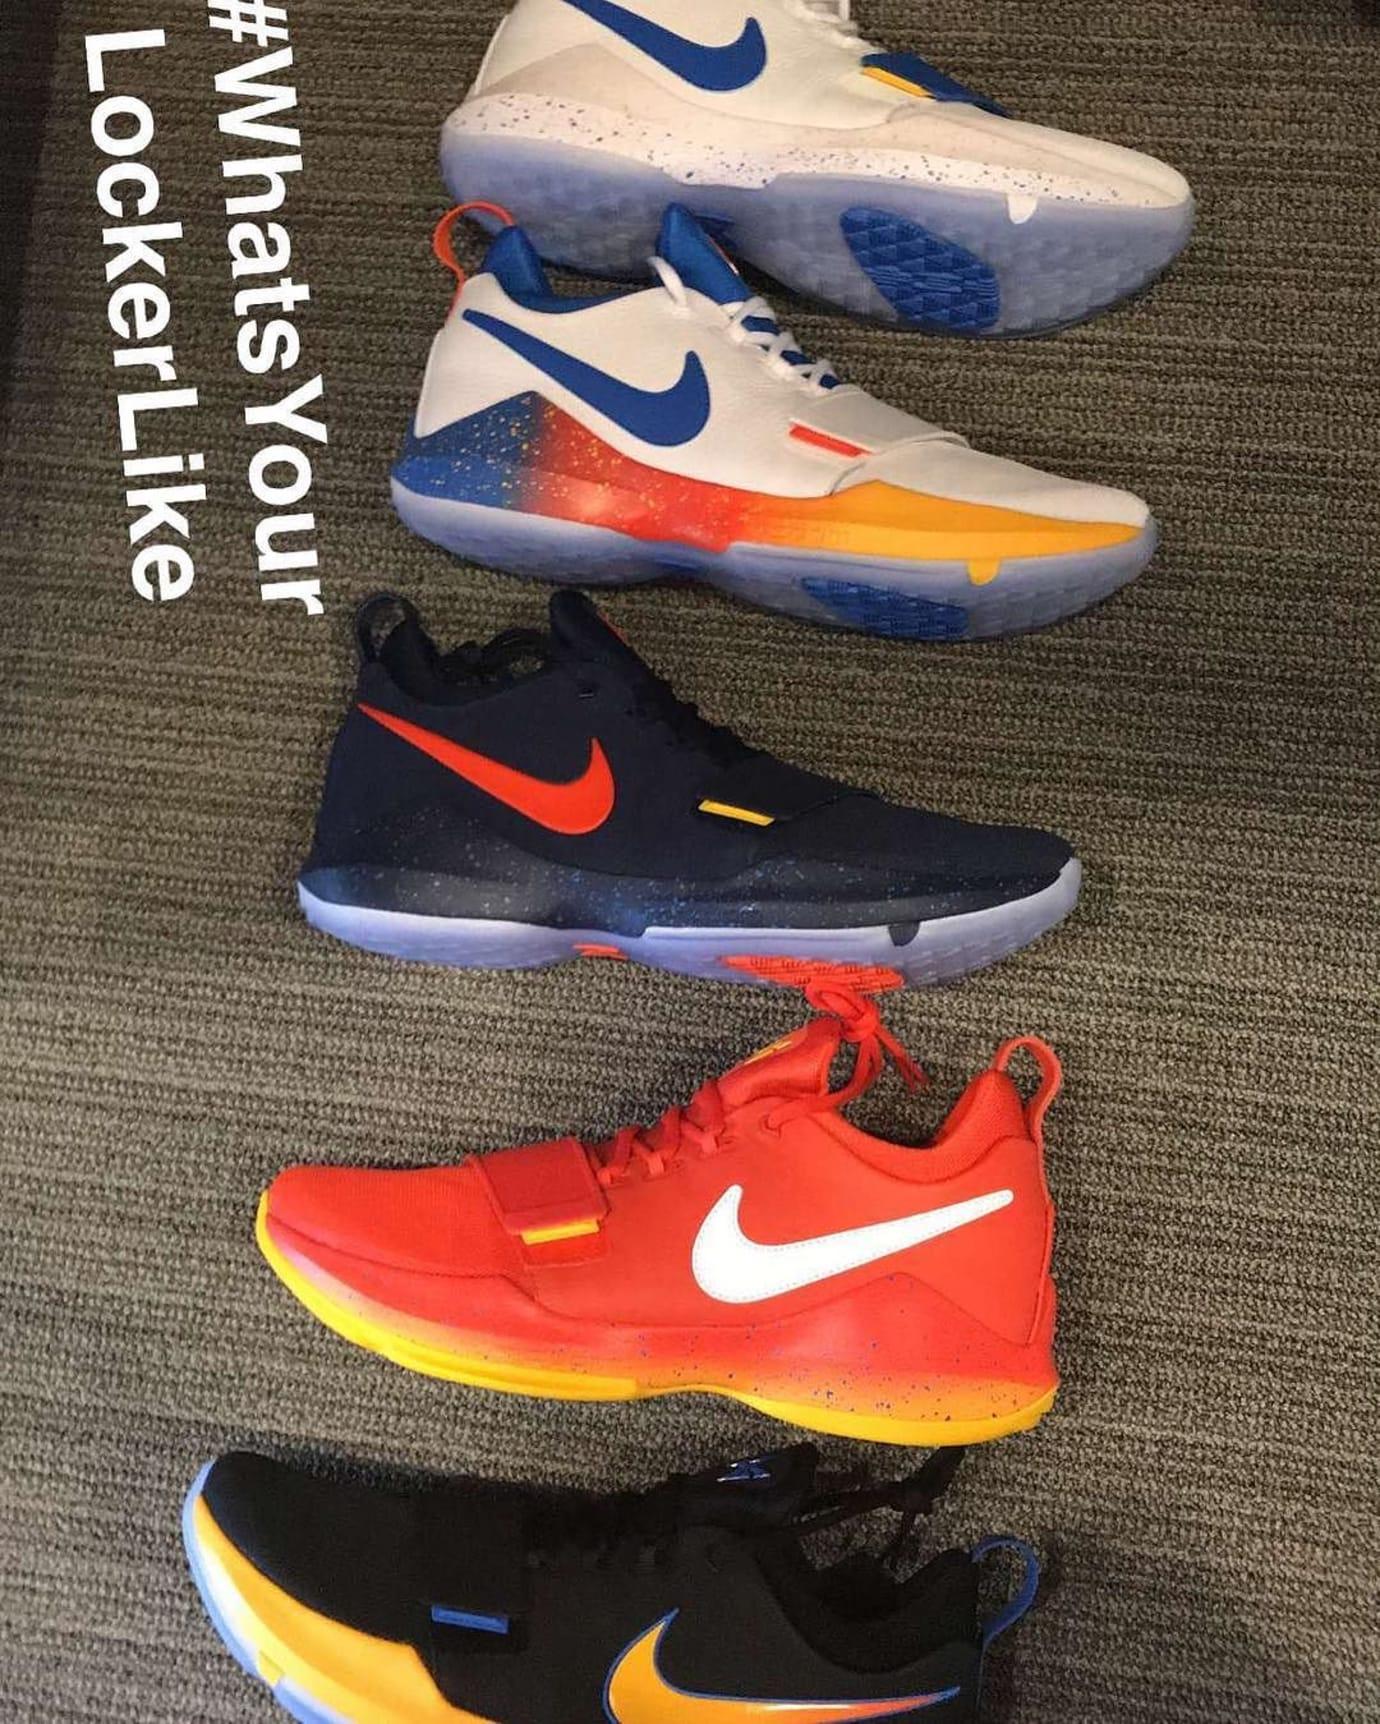 Nike PG1 OKC Colorways